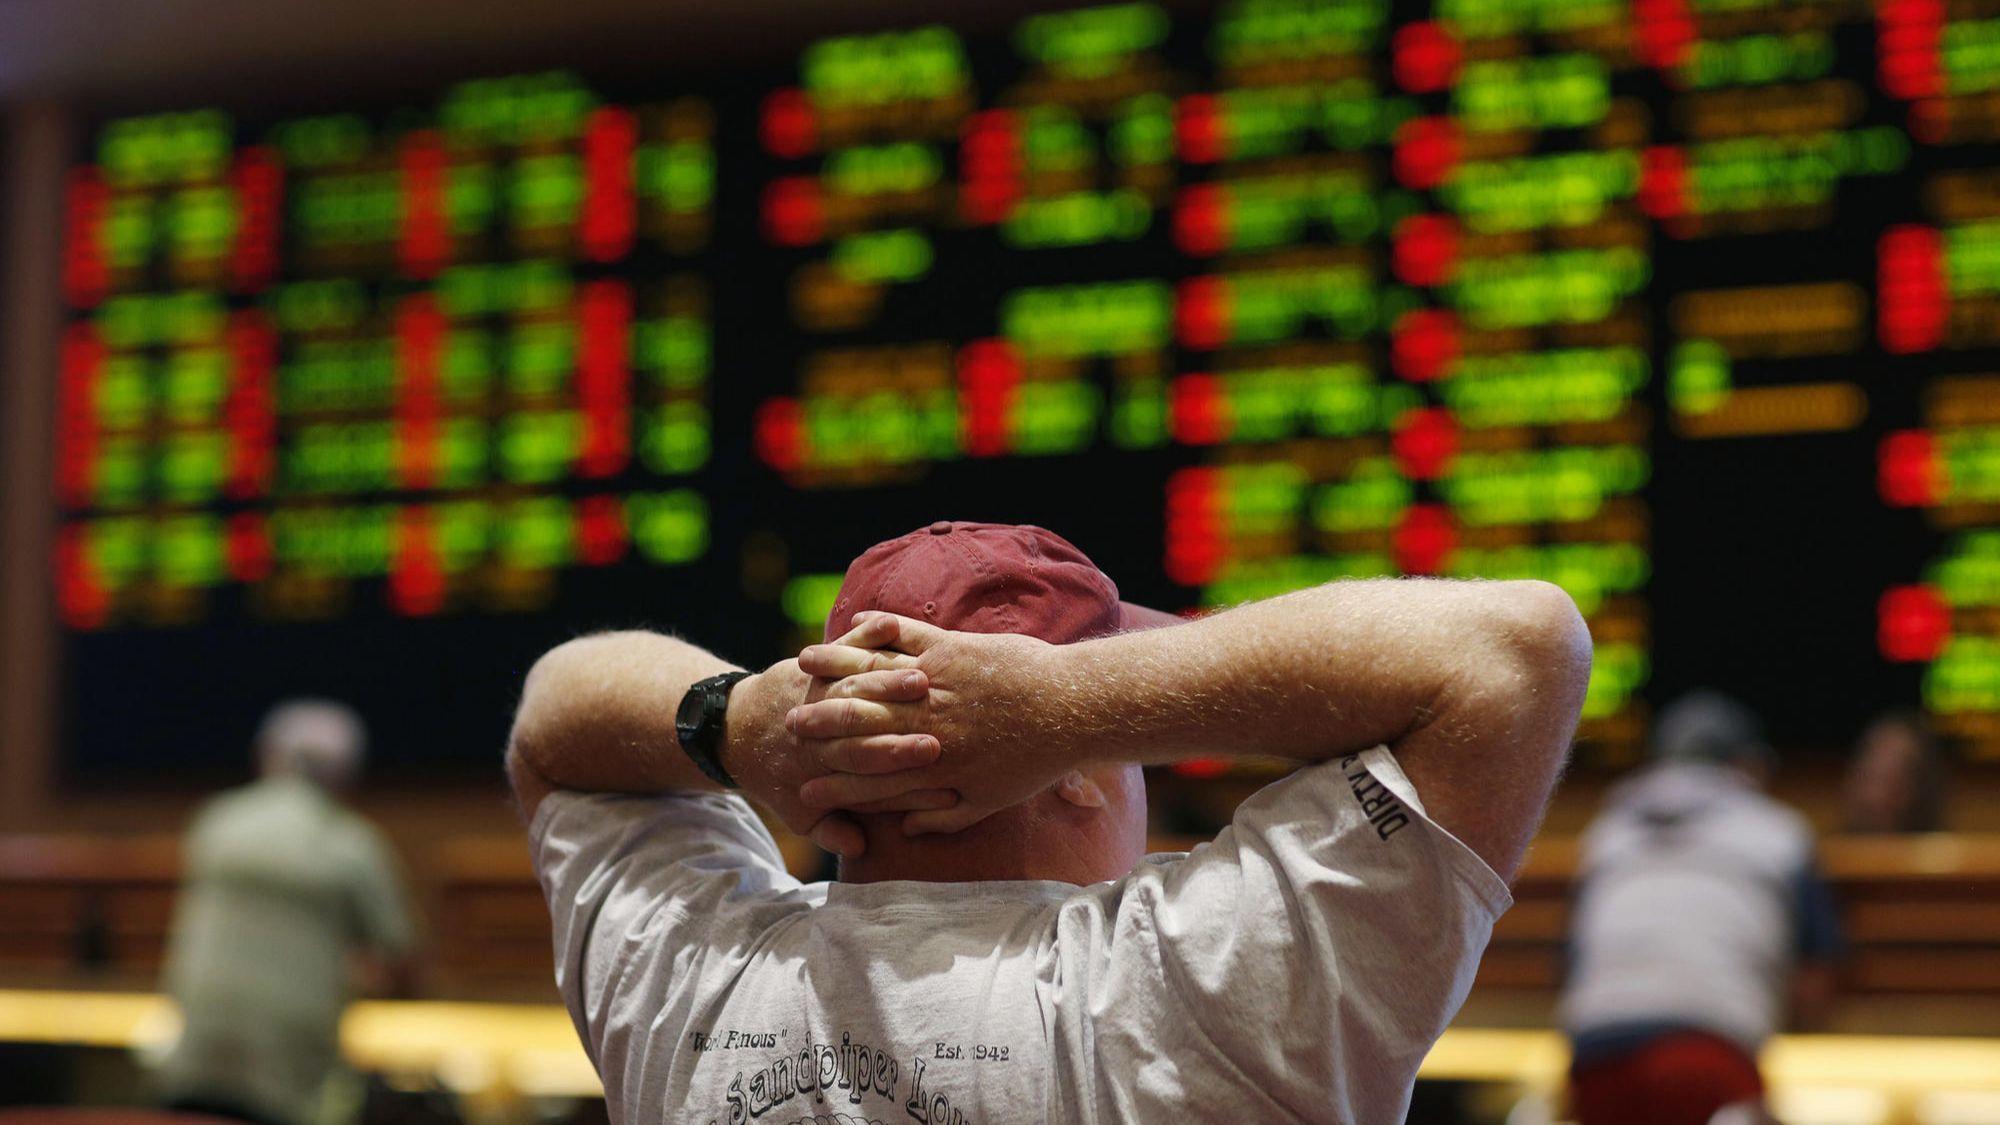 Ct-spt-legalized-sports-gambling-integrity-fee-rosenbloom-20180515